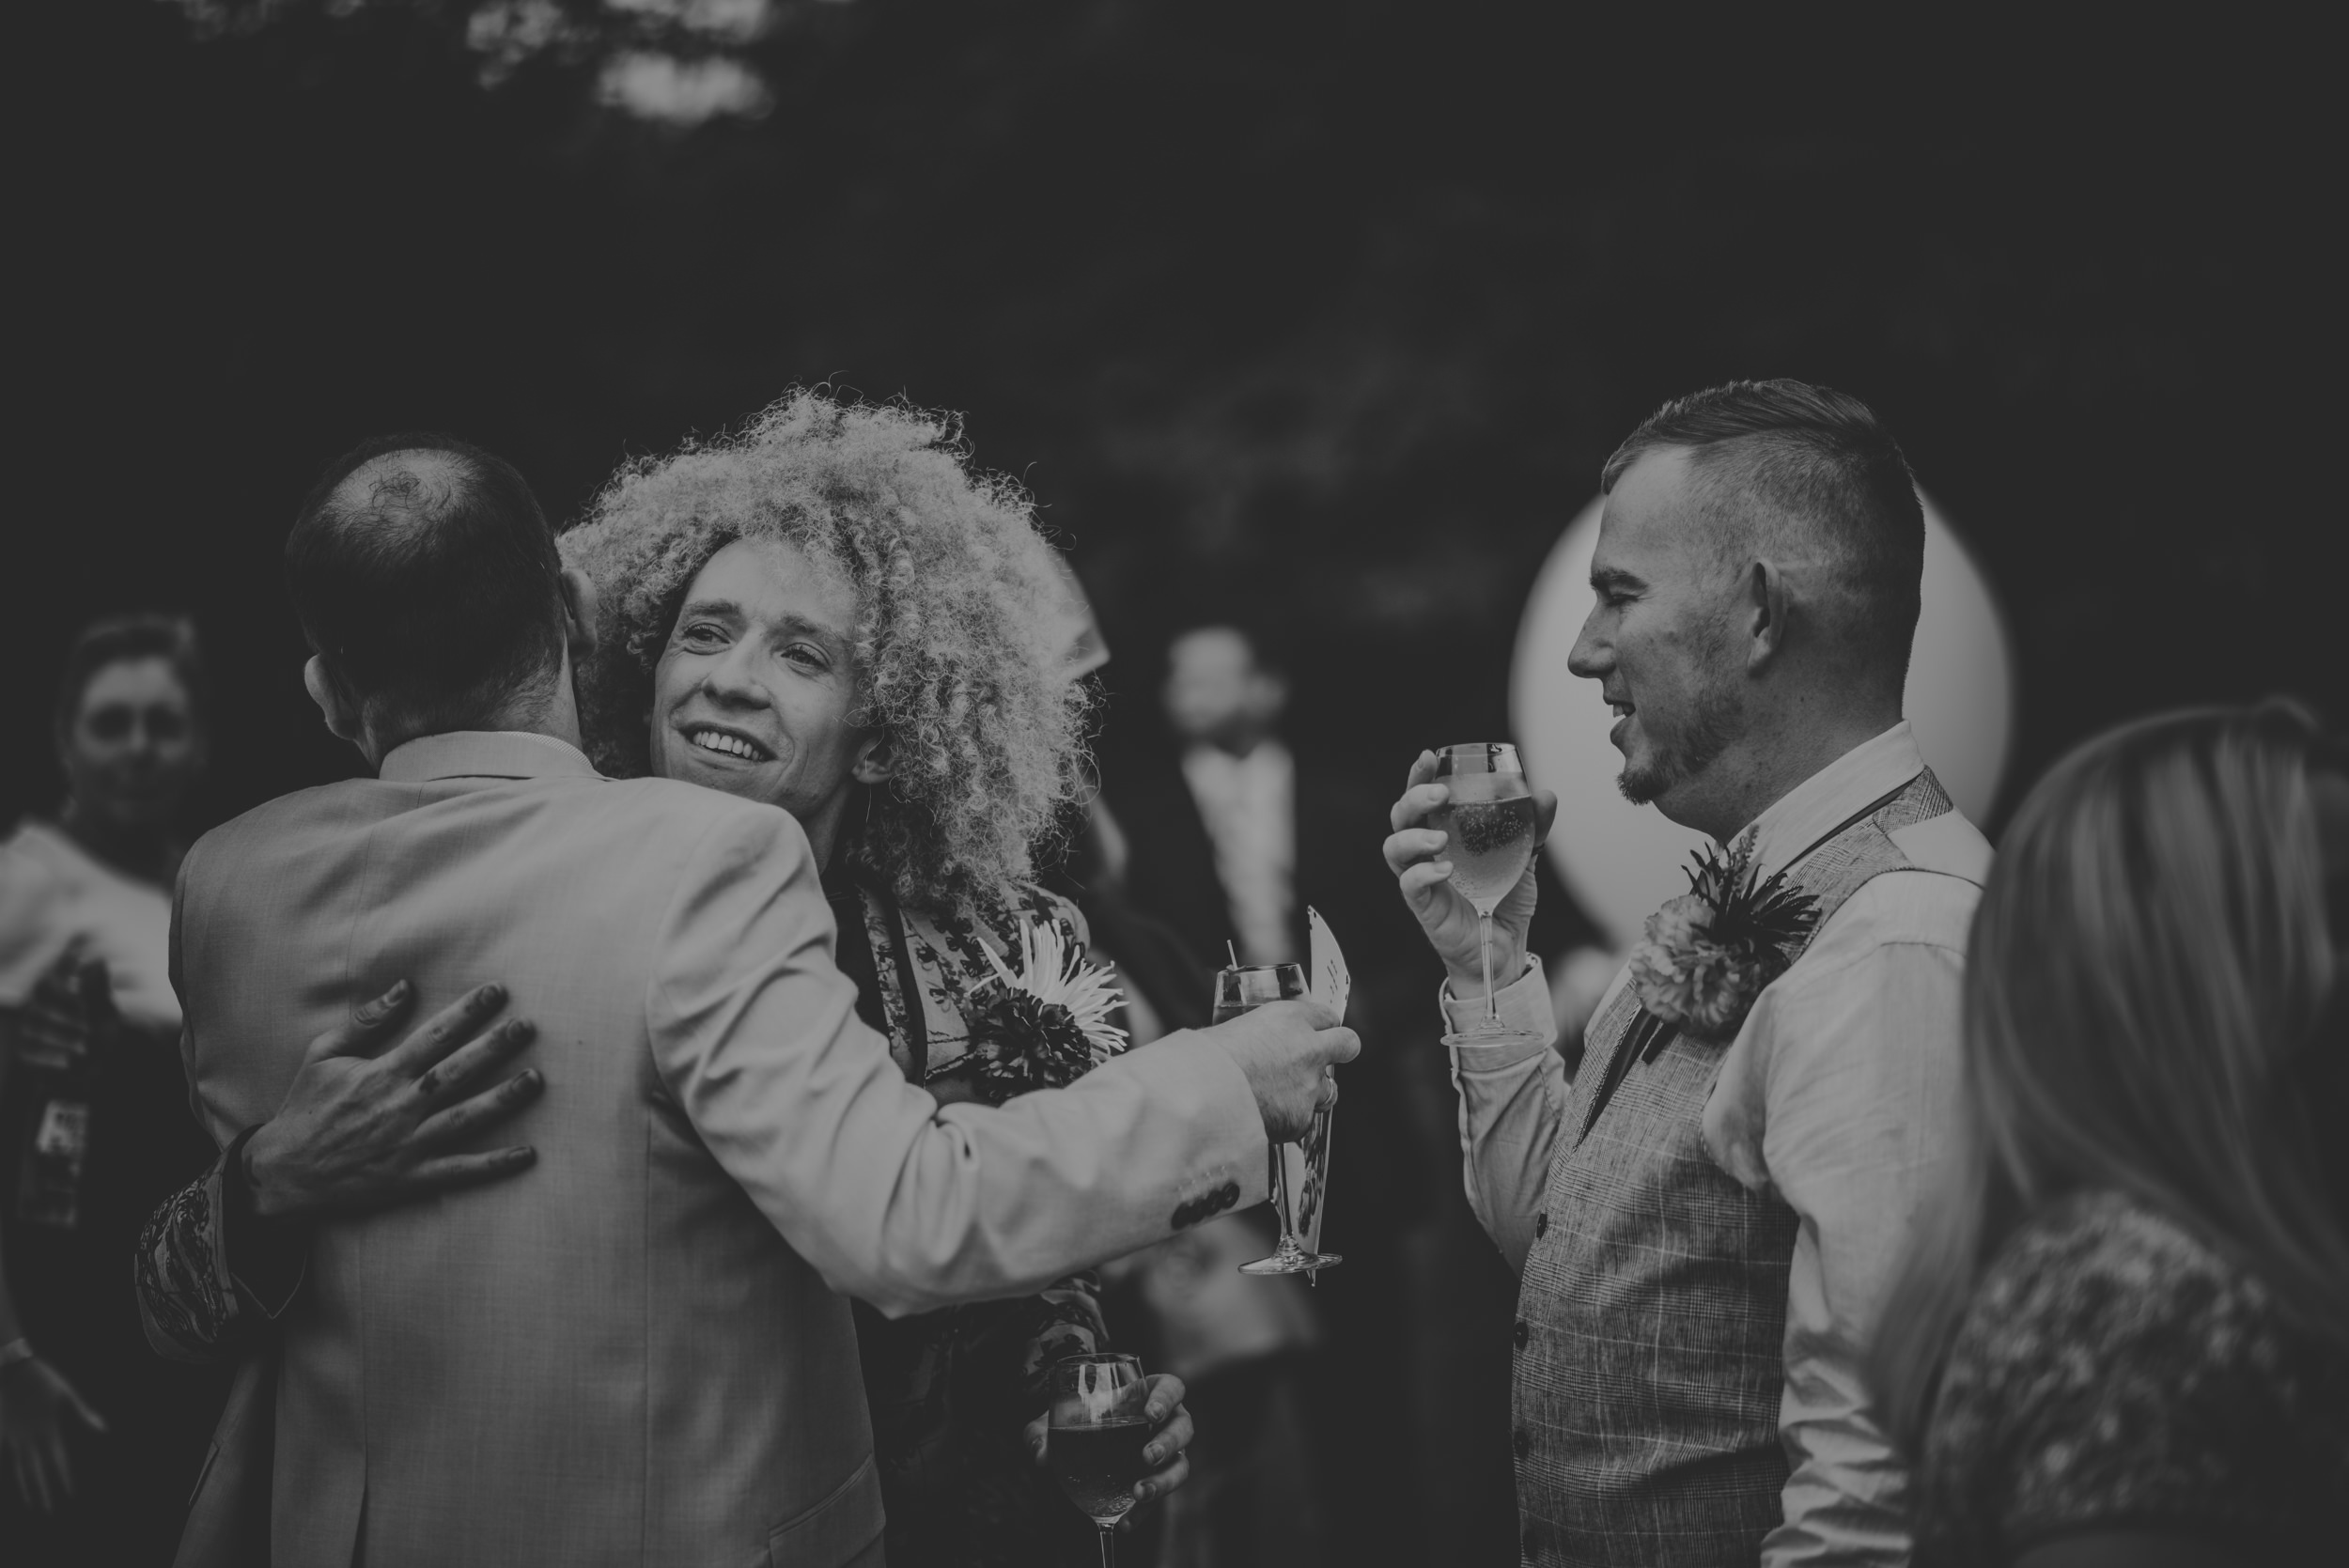 Barry-and-Chaz-wedding-Wasing-Park-Berkshire-Manu-Mendoza-Wedding-Photography-227.jpg